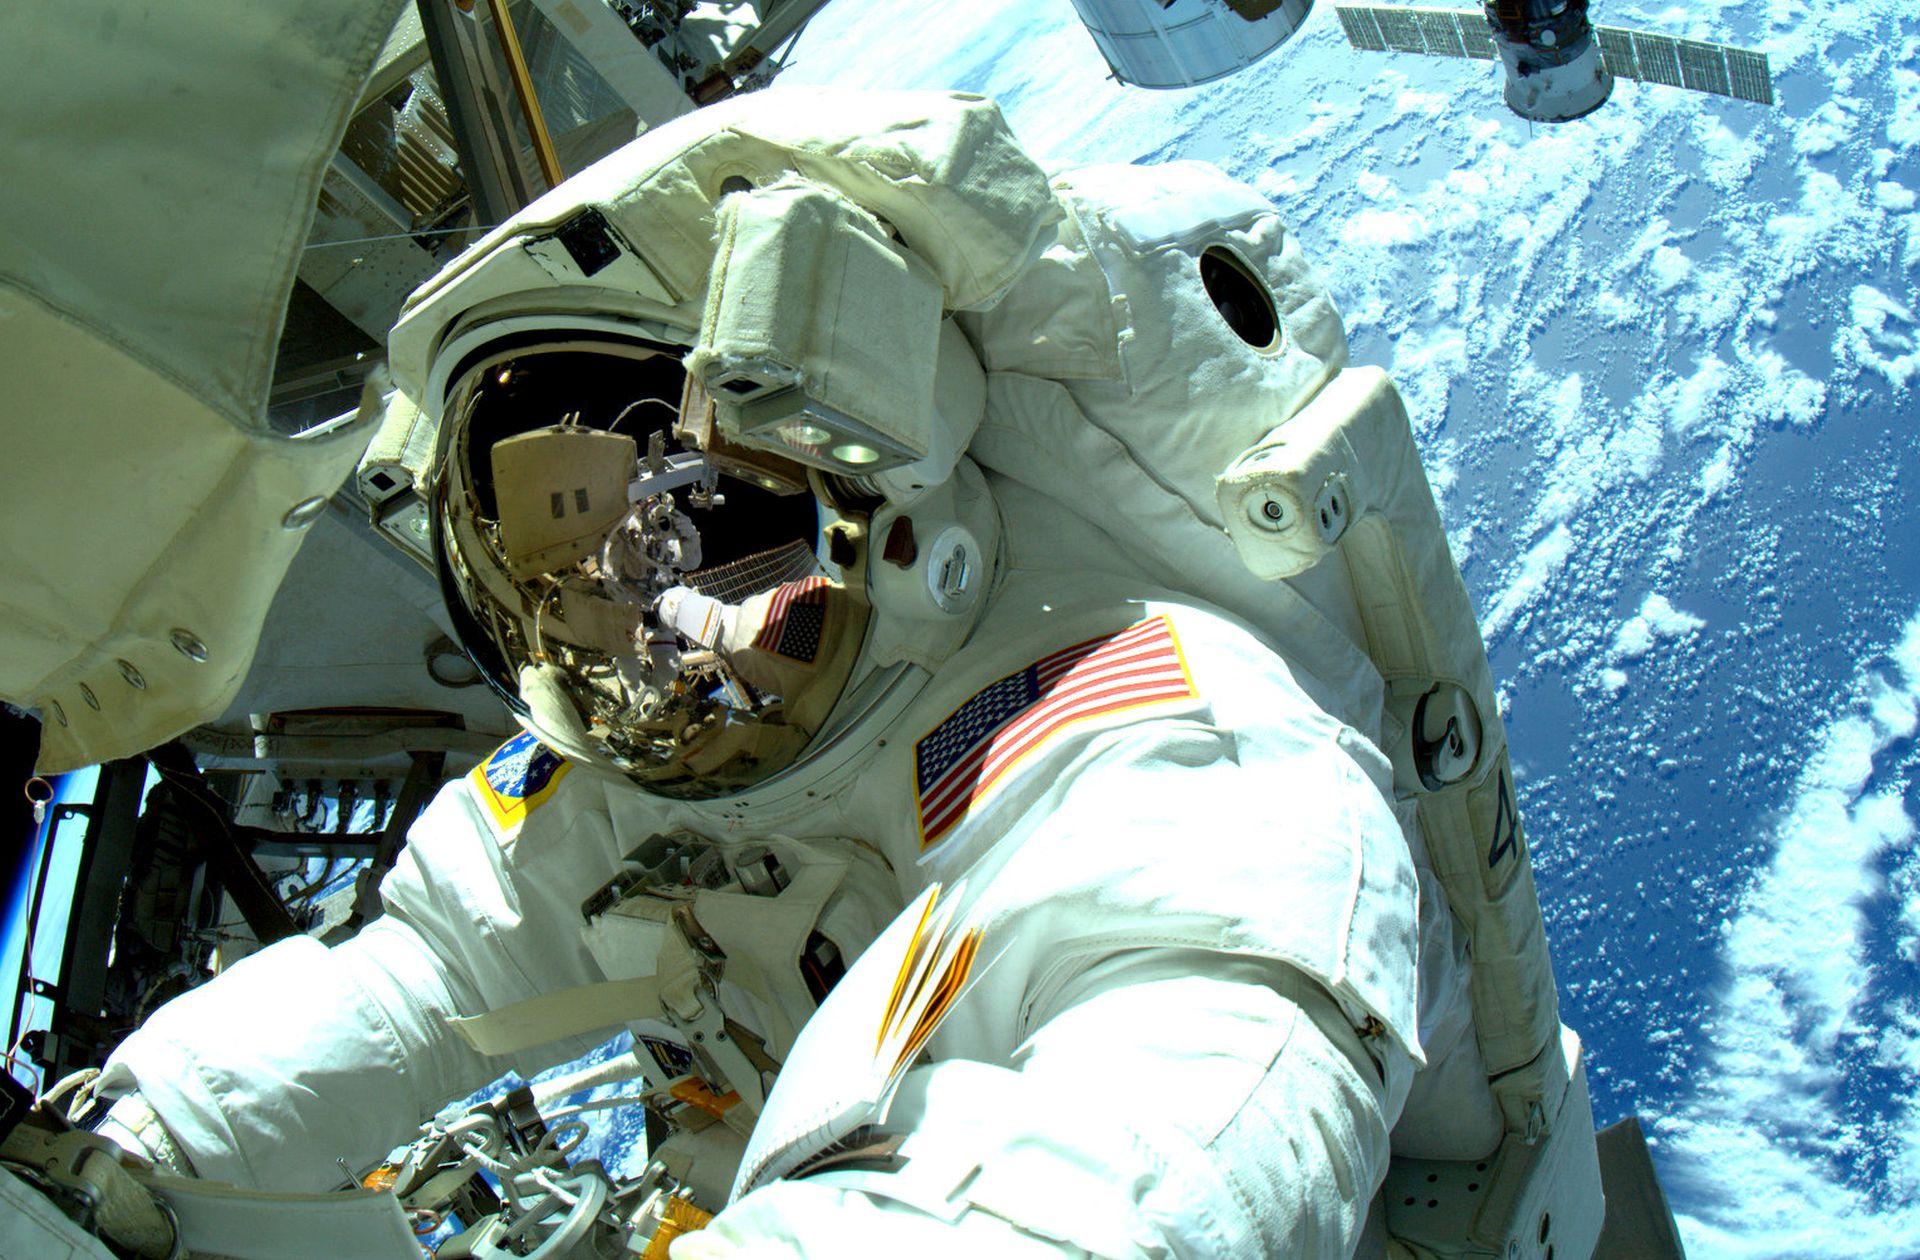 NASA odredila astronaute za komercijalne letove u svemir